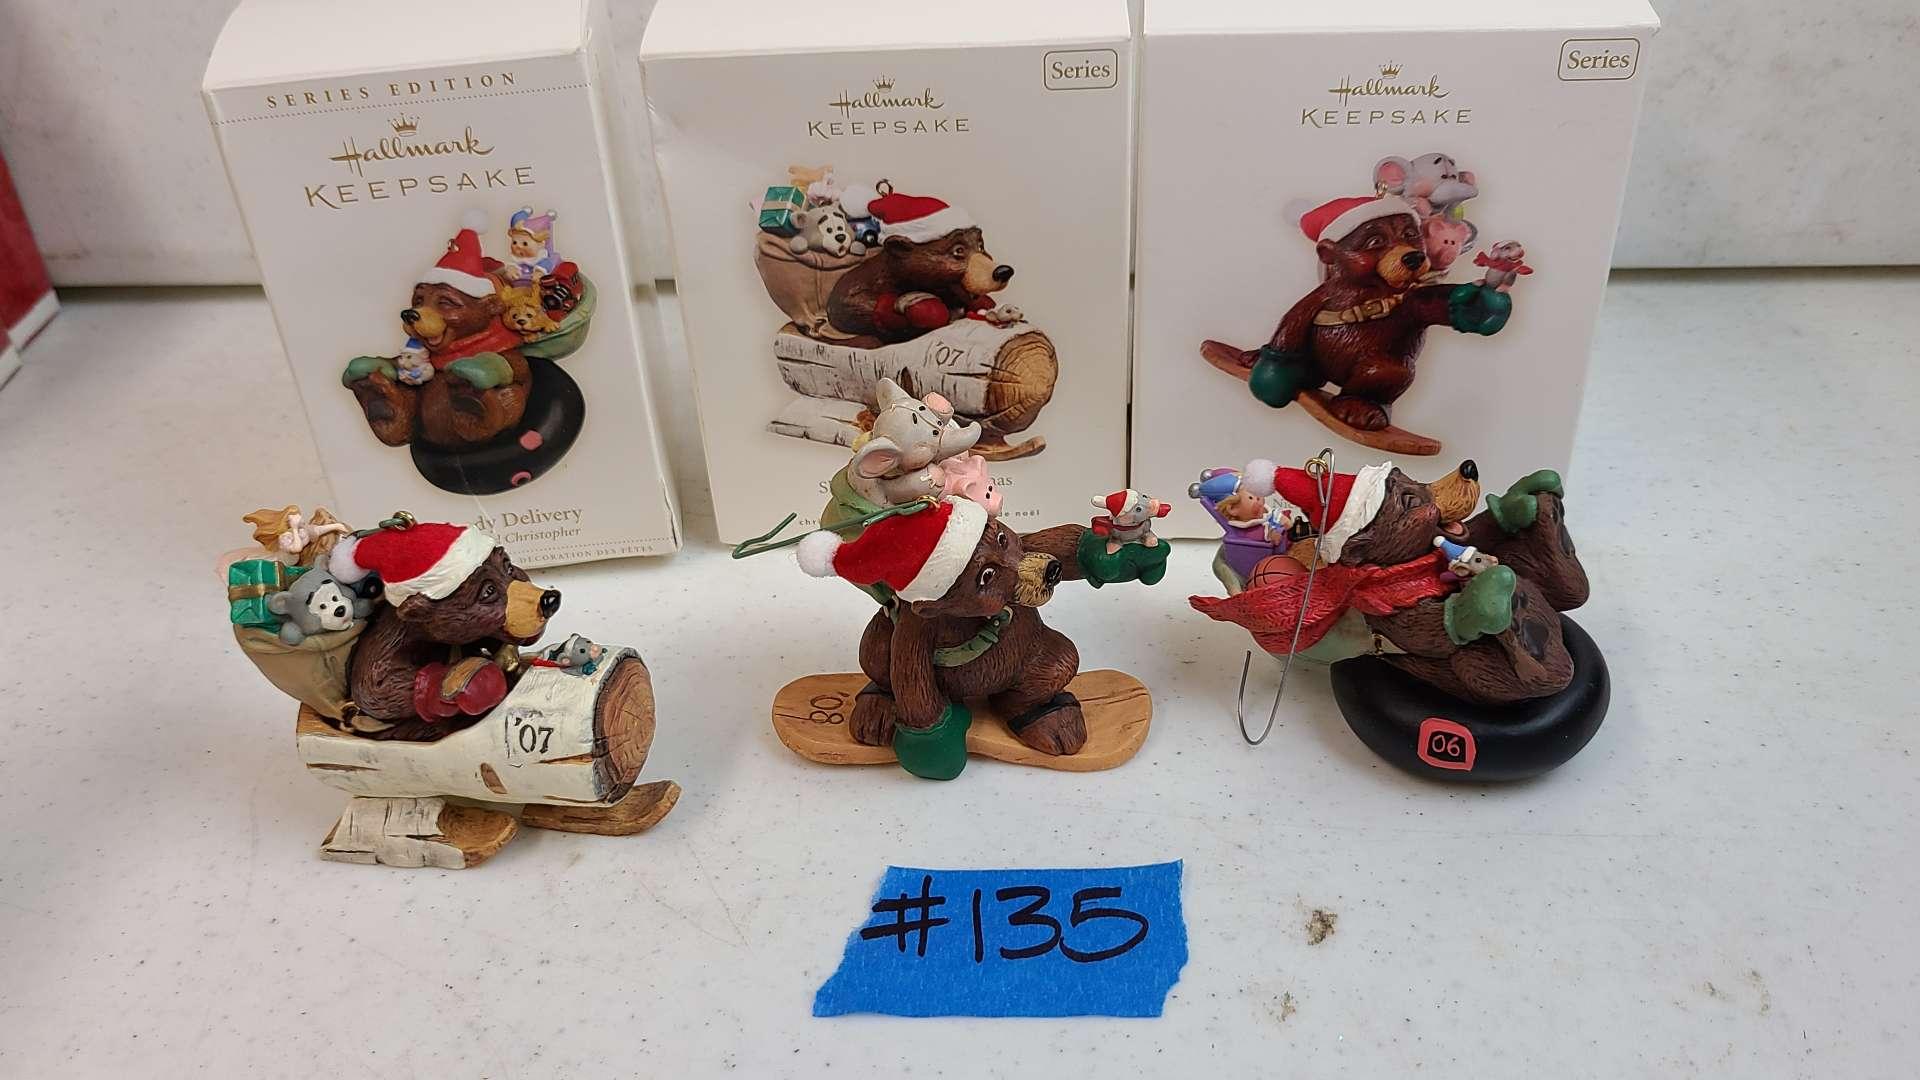 Lot # 135 Lot of Hallmark Keepsake Chirstmas Ornaments